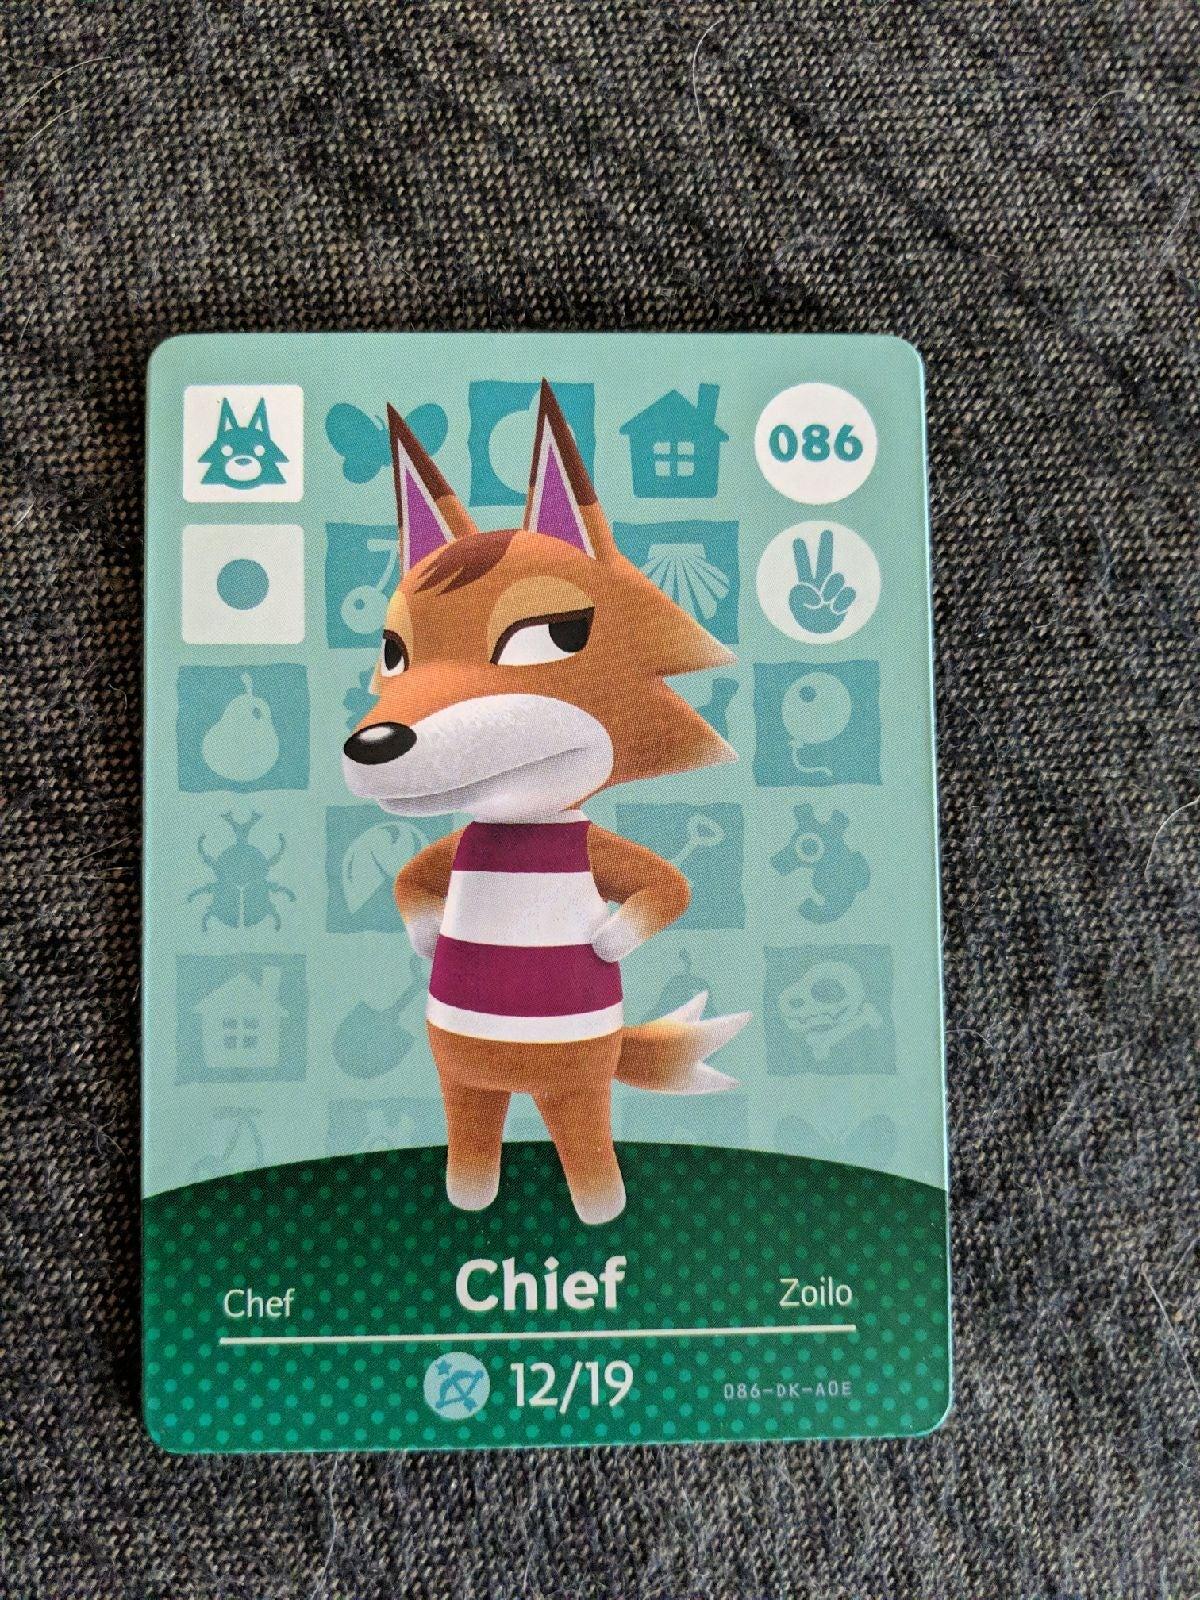 Cheif - Animal Crossing Amiibo Card